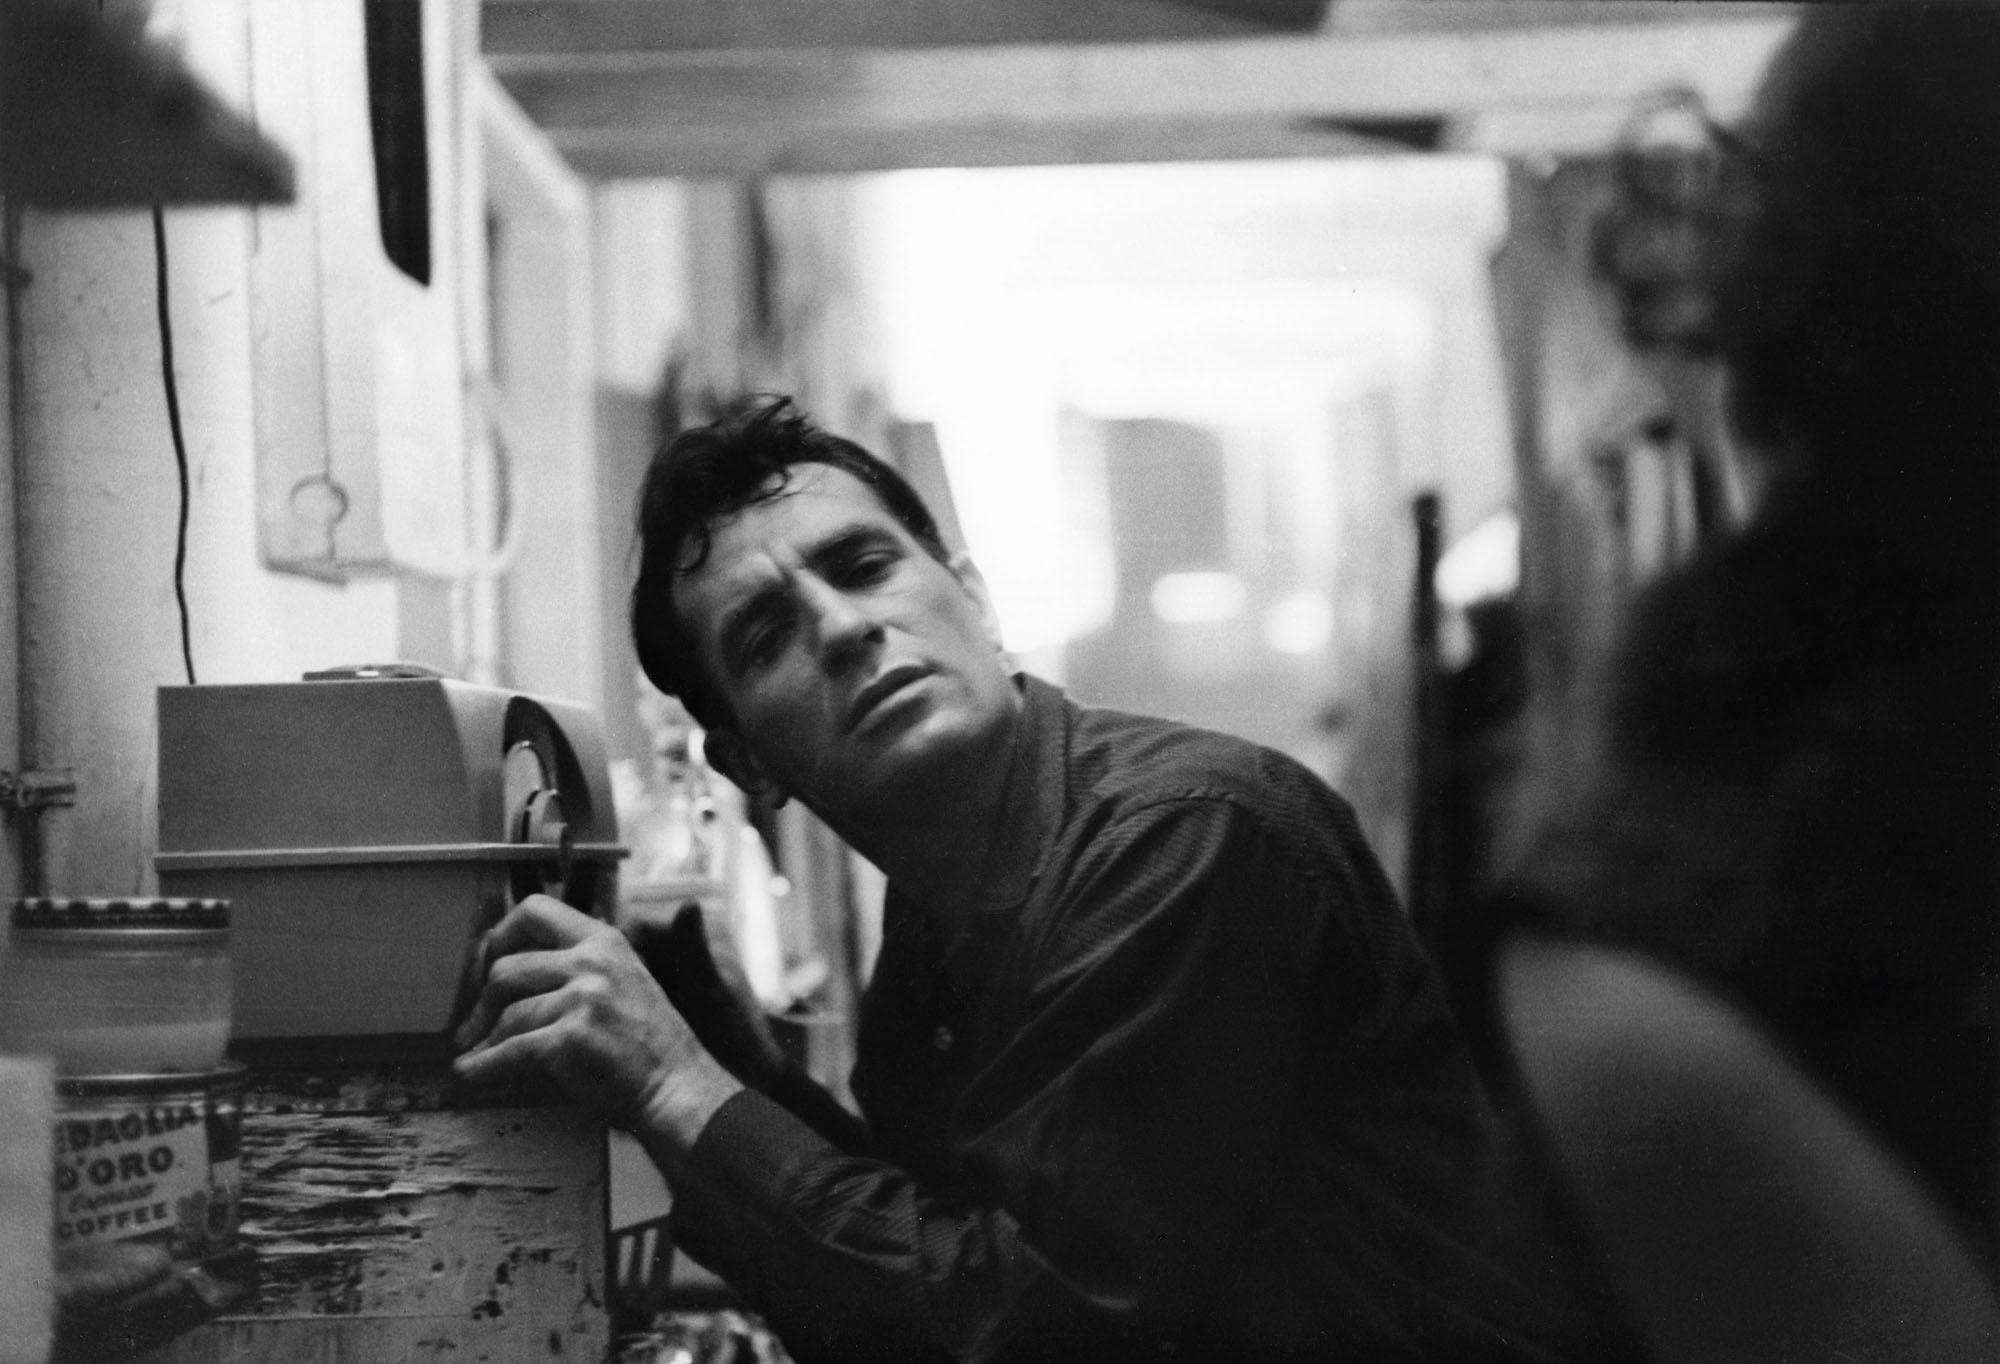 Jack Kerouac in corduroy